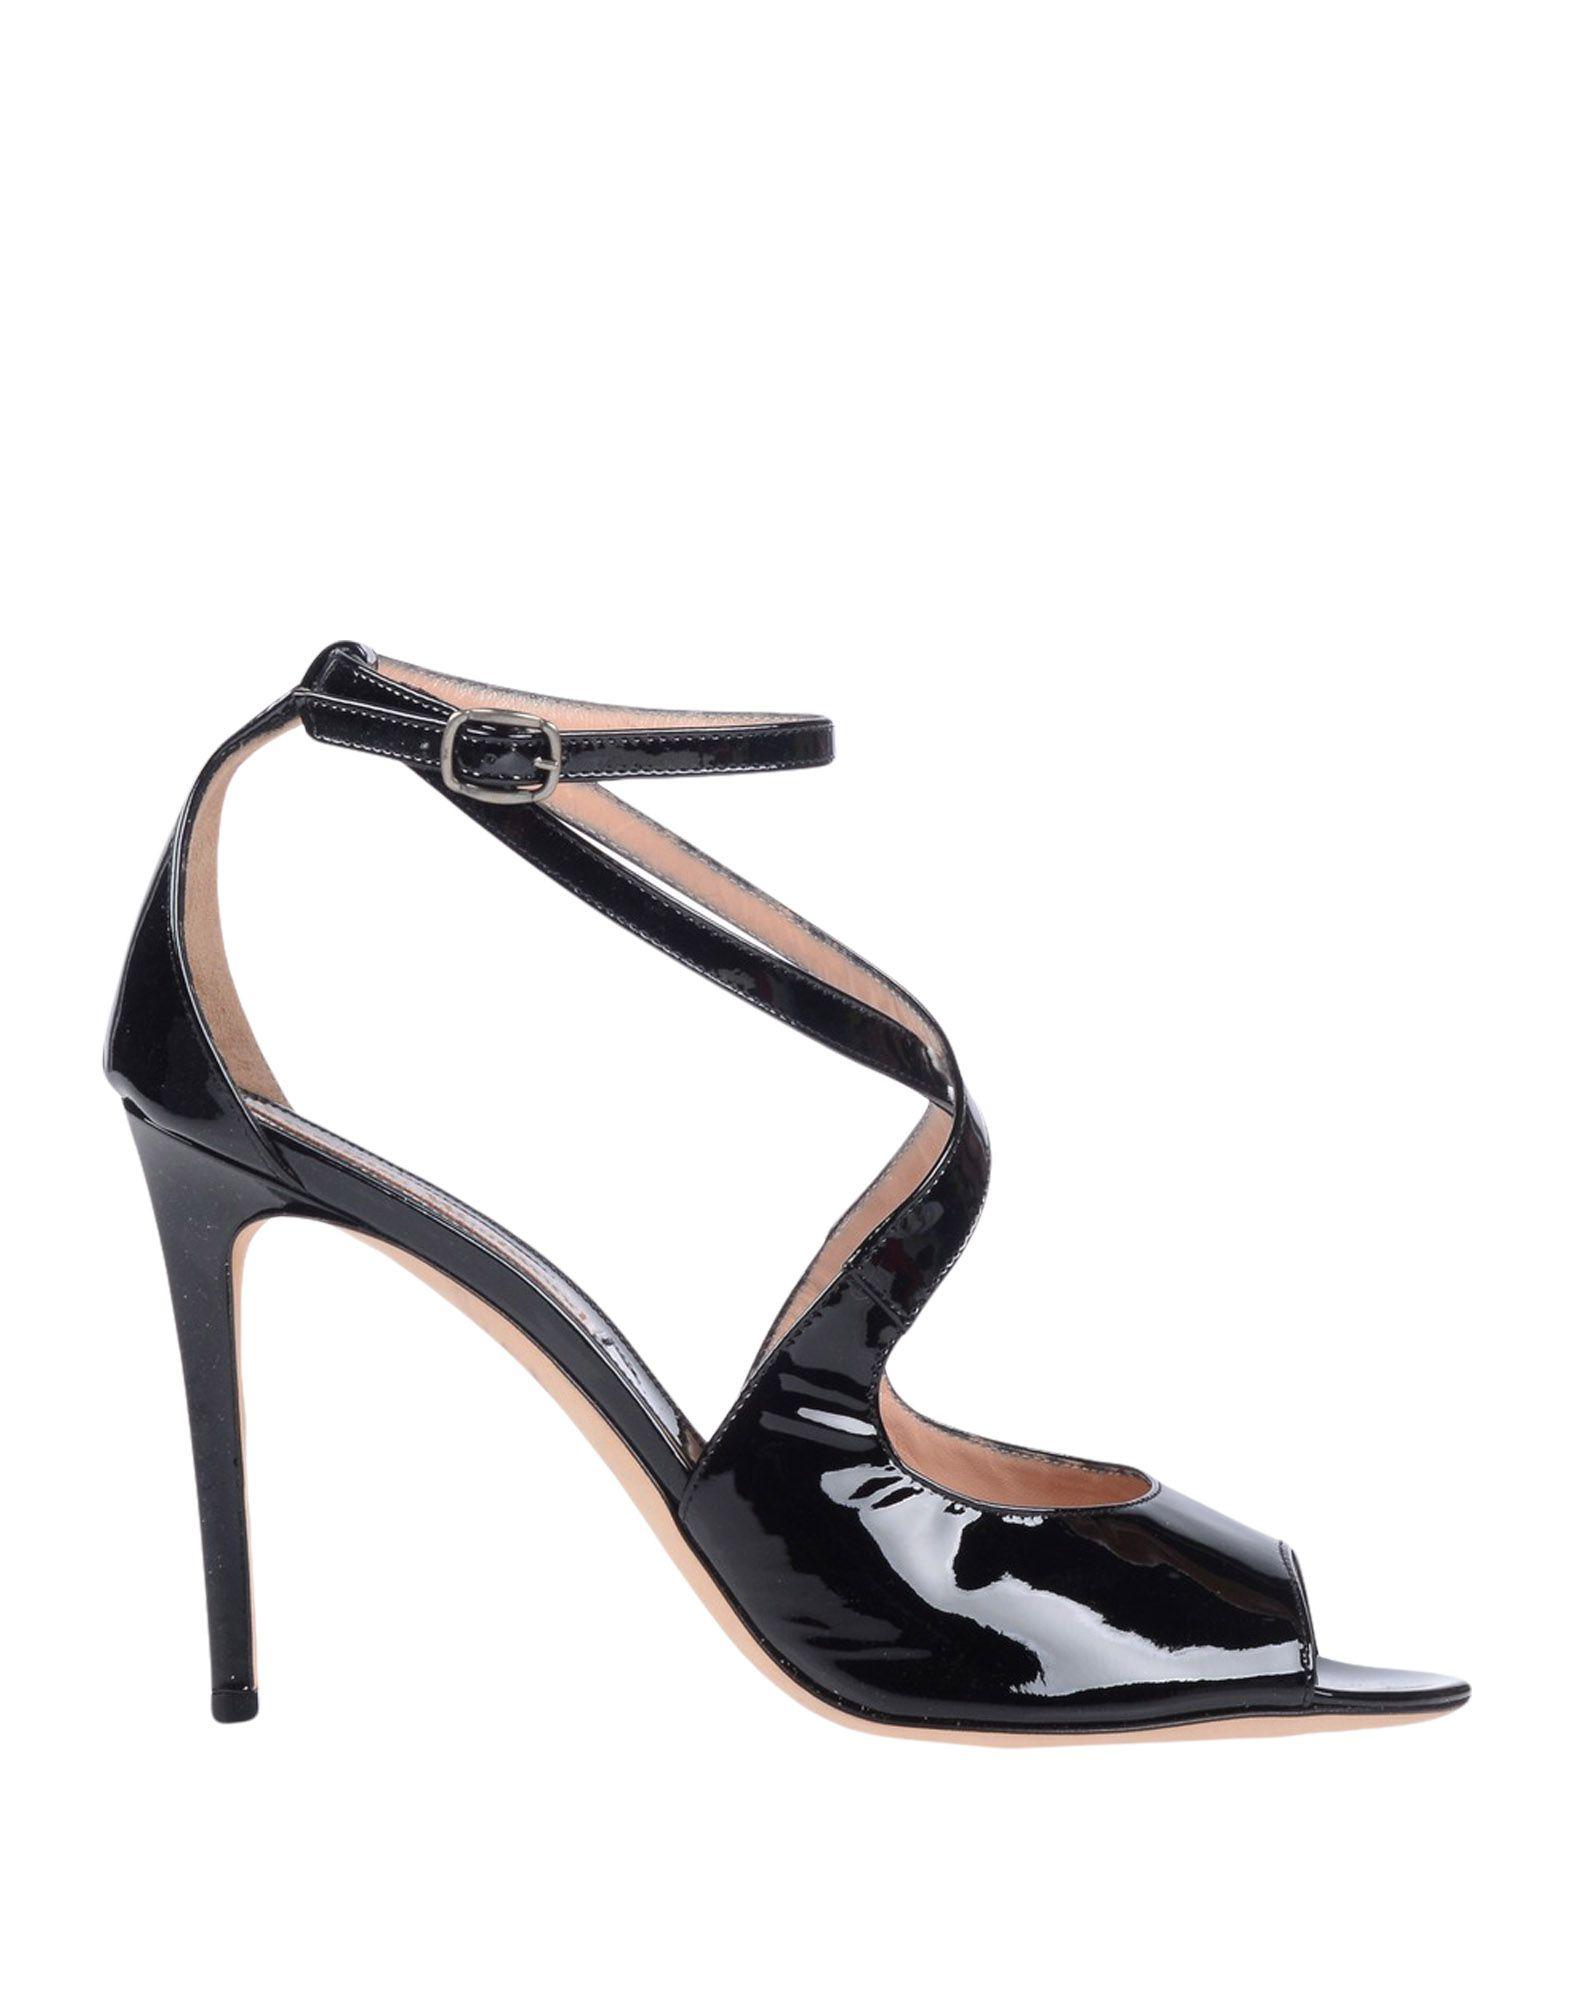 Vivienne Westwood Sandals - Women Vivienne Westwood Sandals online on 11522752NK  United Kingdom - 11522752NK on ec0b4a